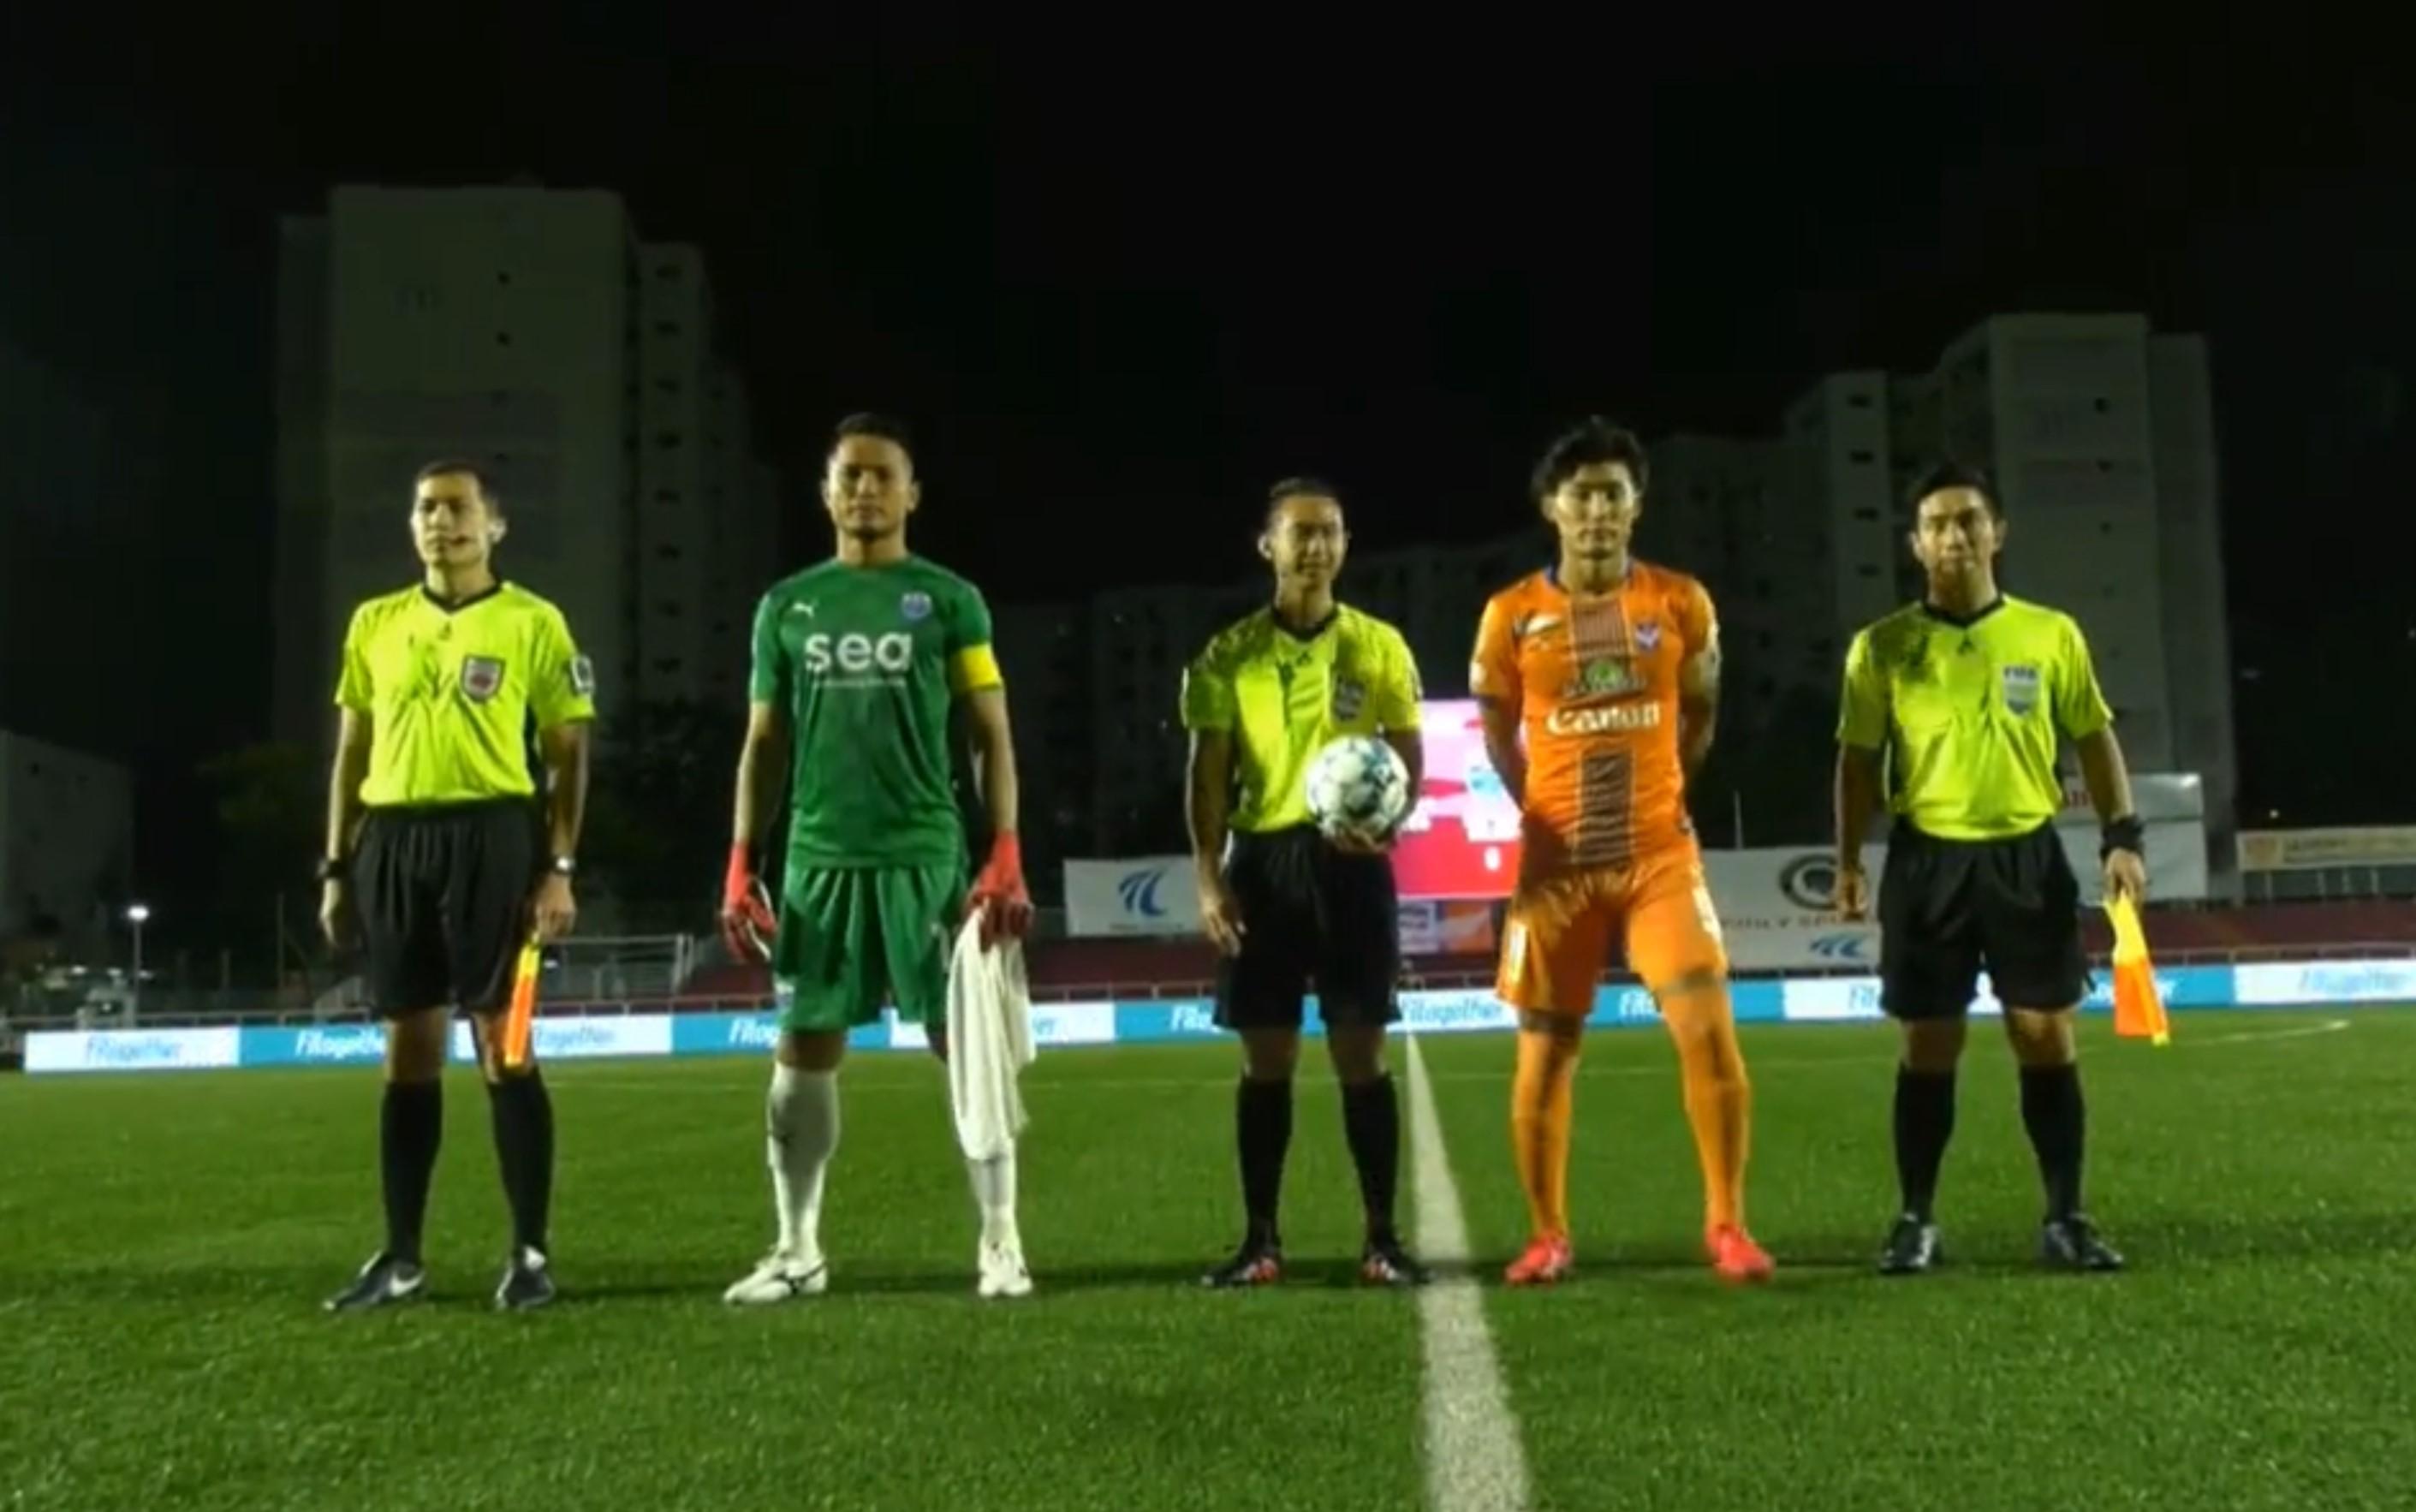 SPL : Leaders Albirex Niigata maintain 12-match unbeaten run with 1-1 draw against 2nd-ranked Sailors!